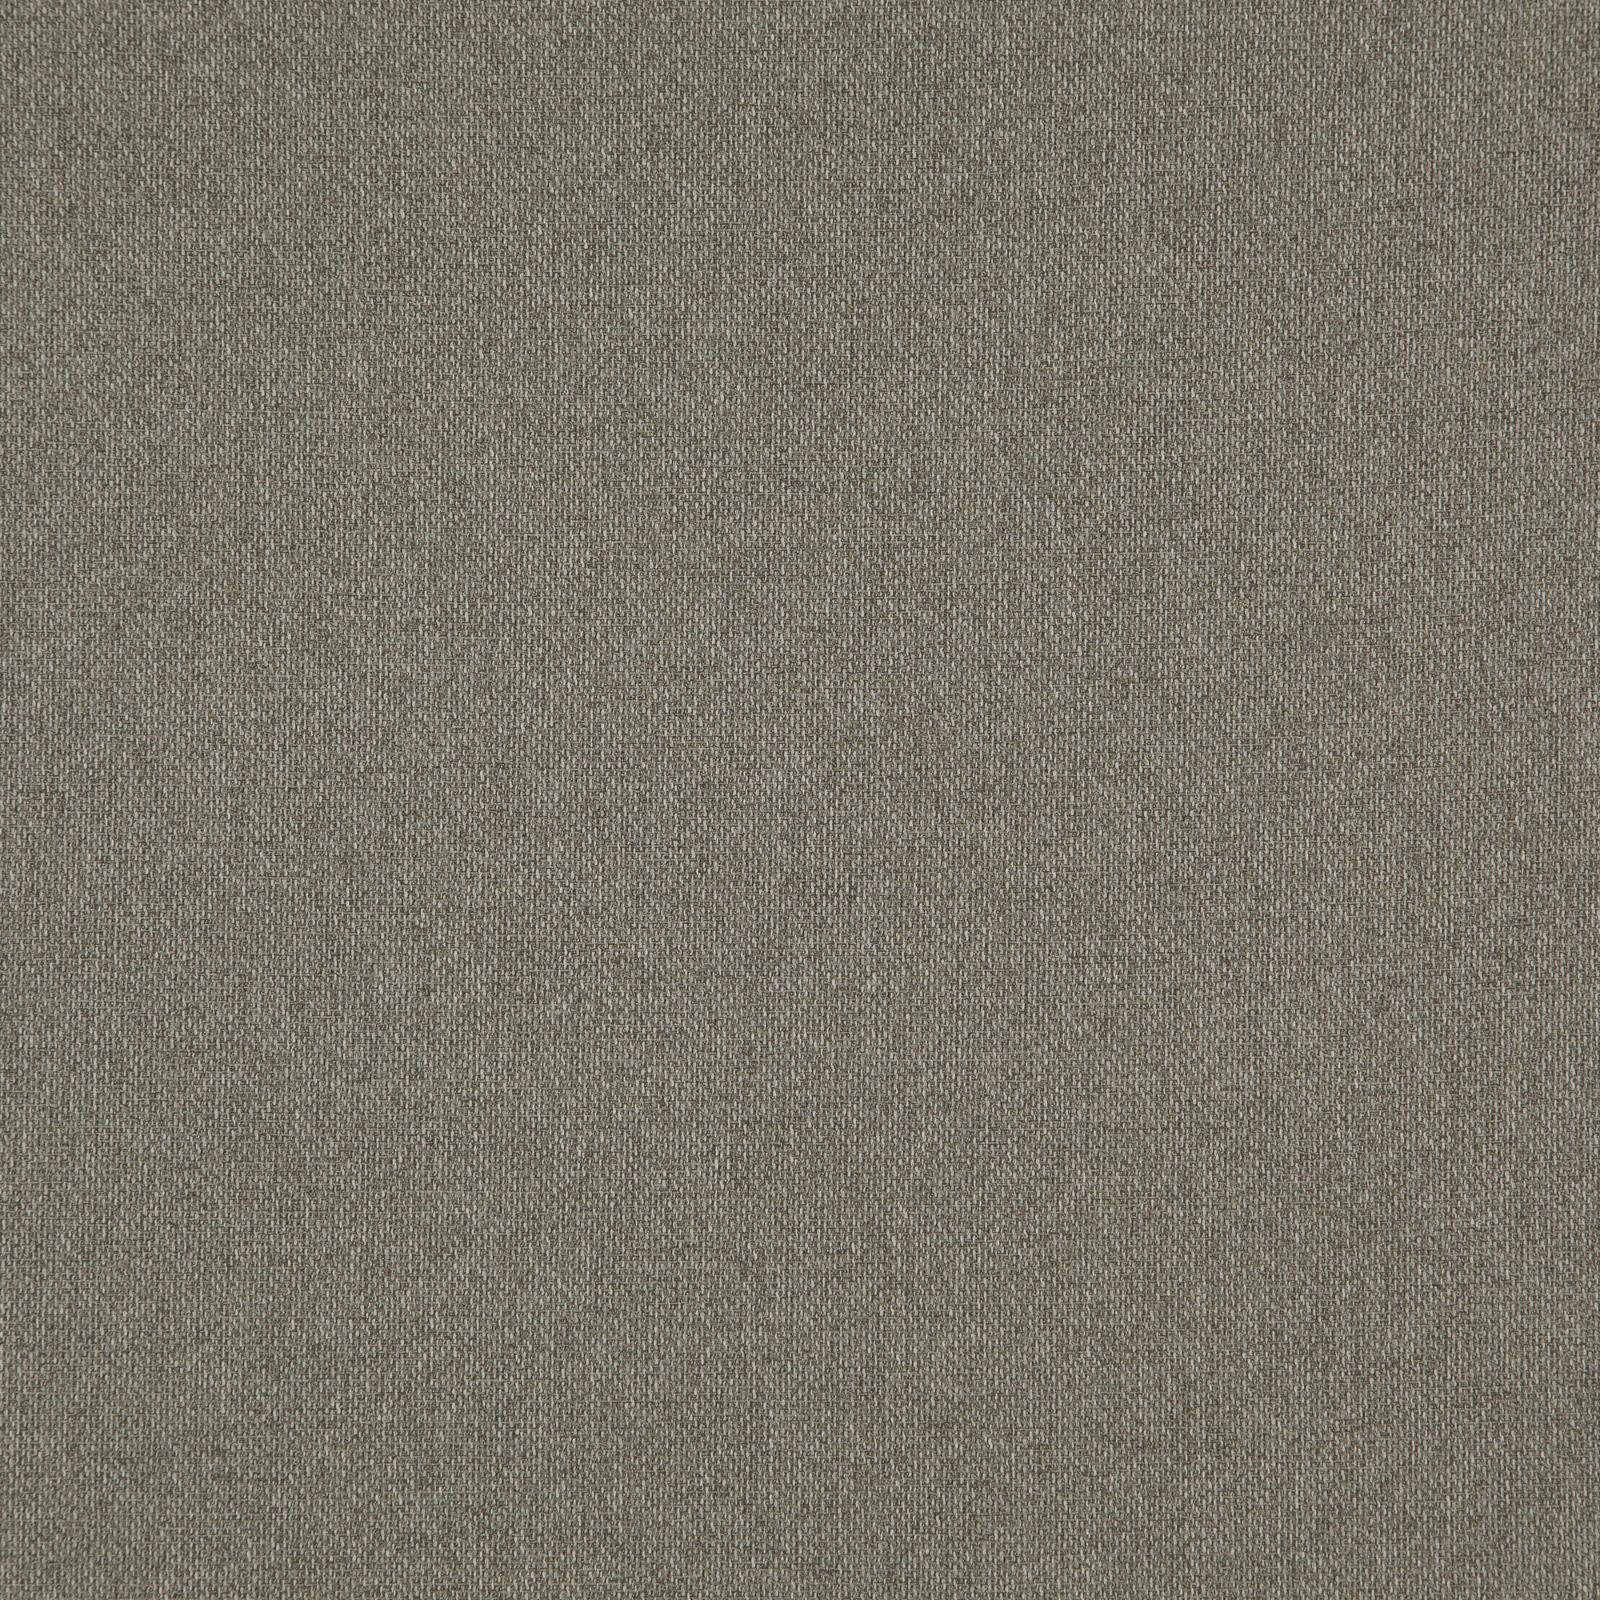 Ampersand Mushroom  100% Polyester  Approx. 145cm | Plain  Upholstery 100,000 Rubs  Flame Retardant | Water Repellant